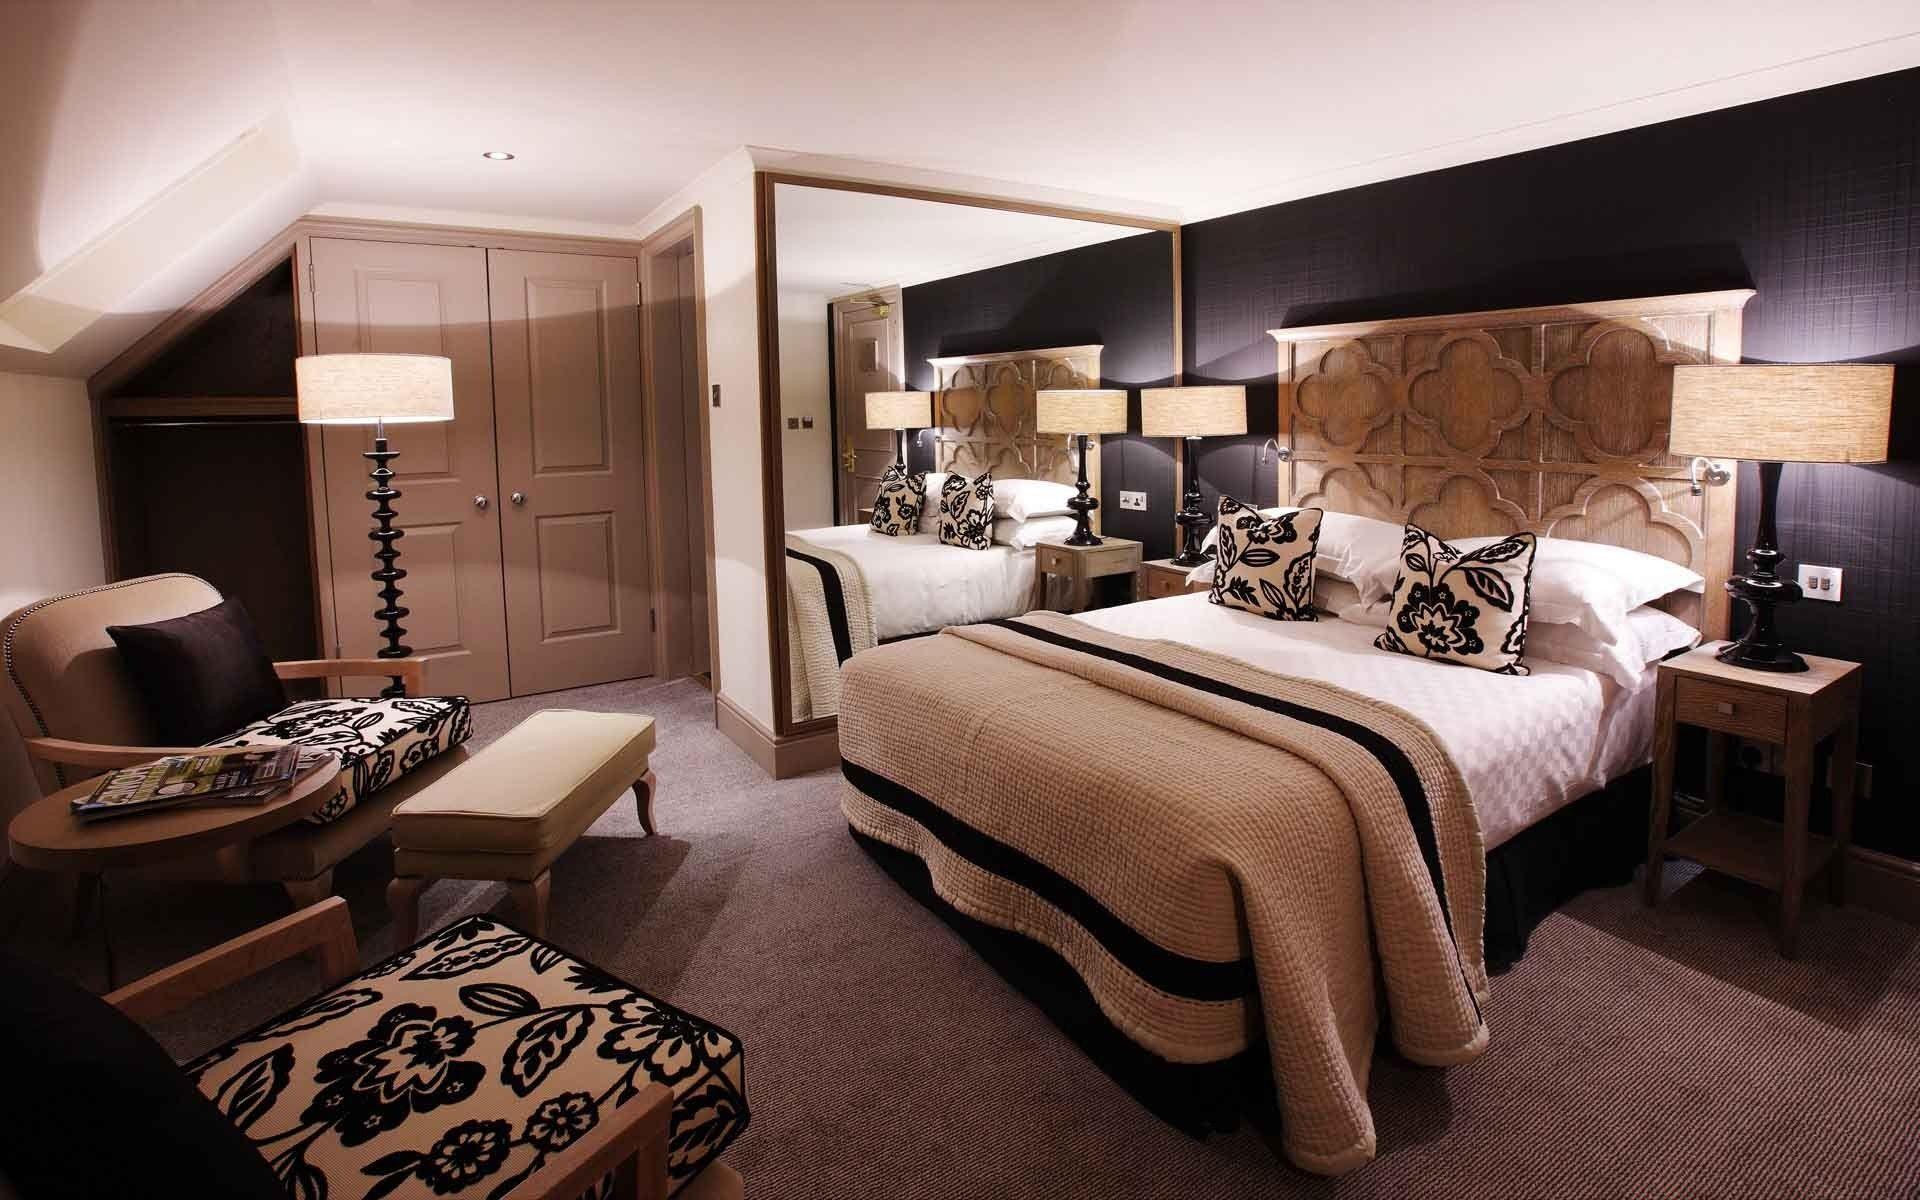 Top romantic bedroom ideas for couples creative bedroom